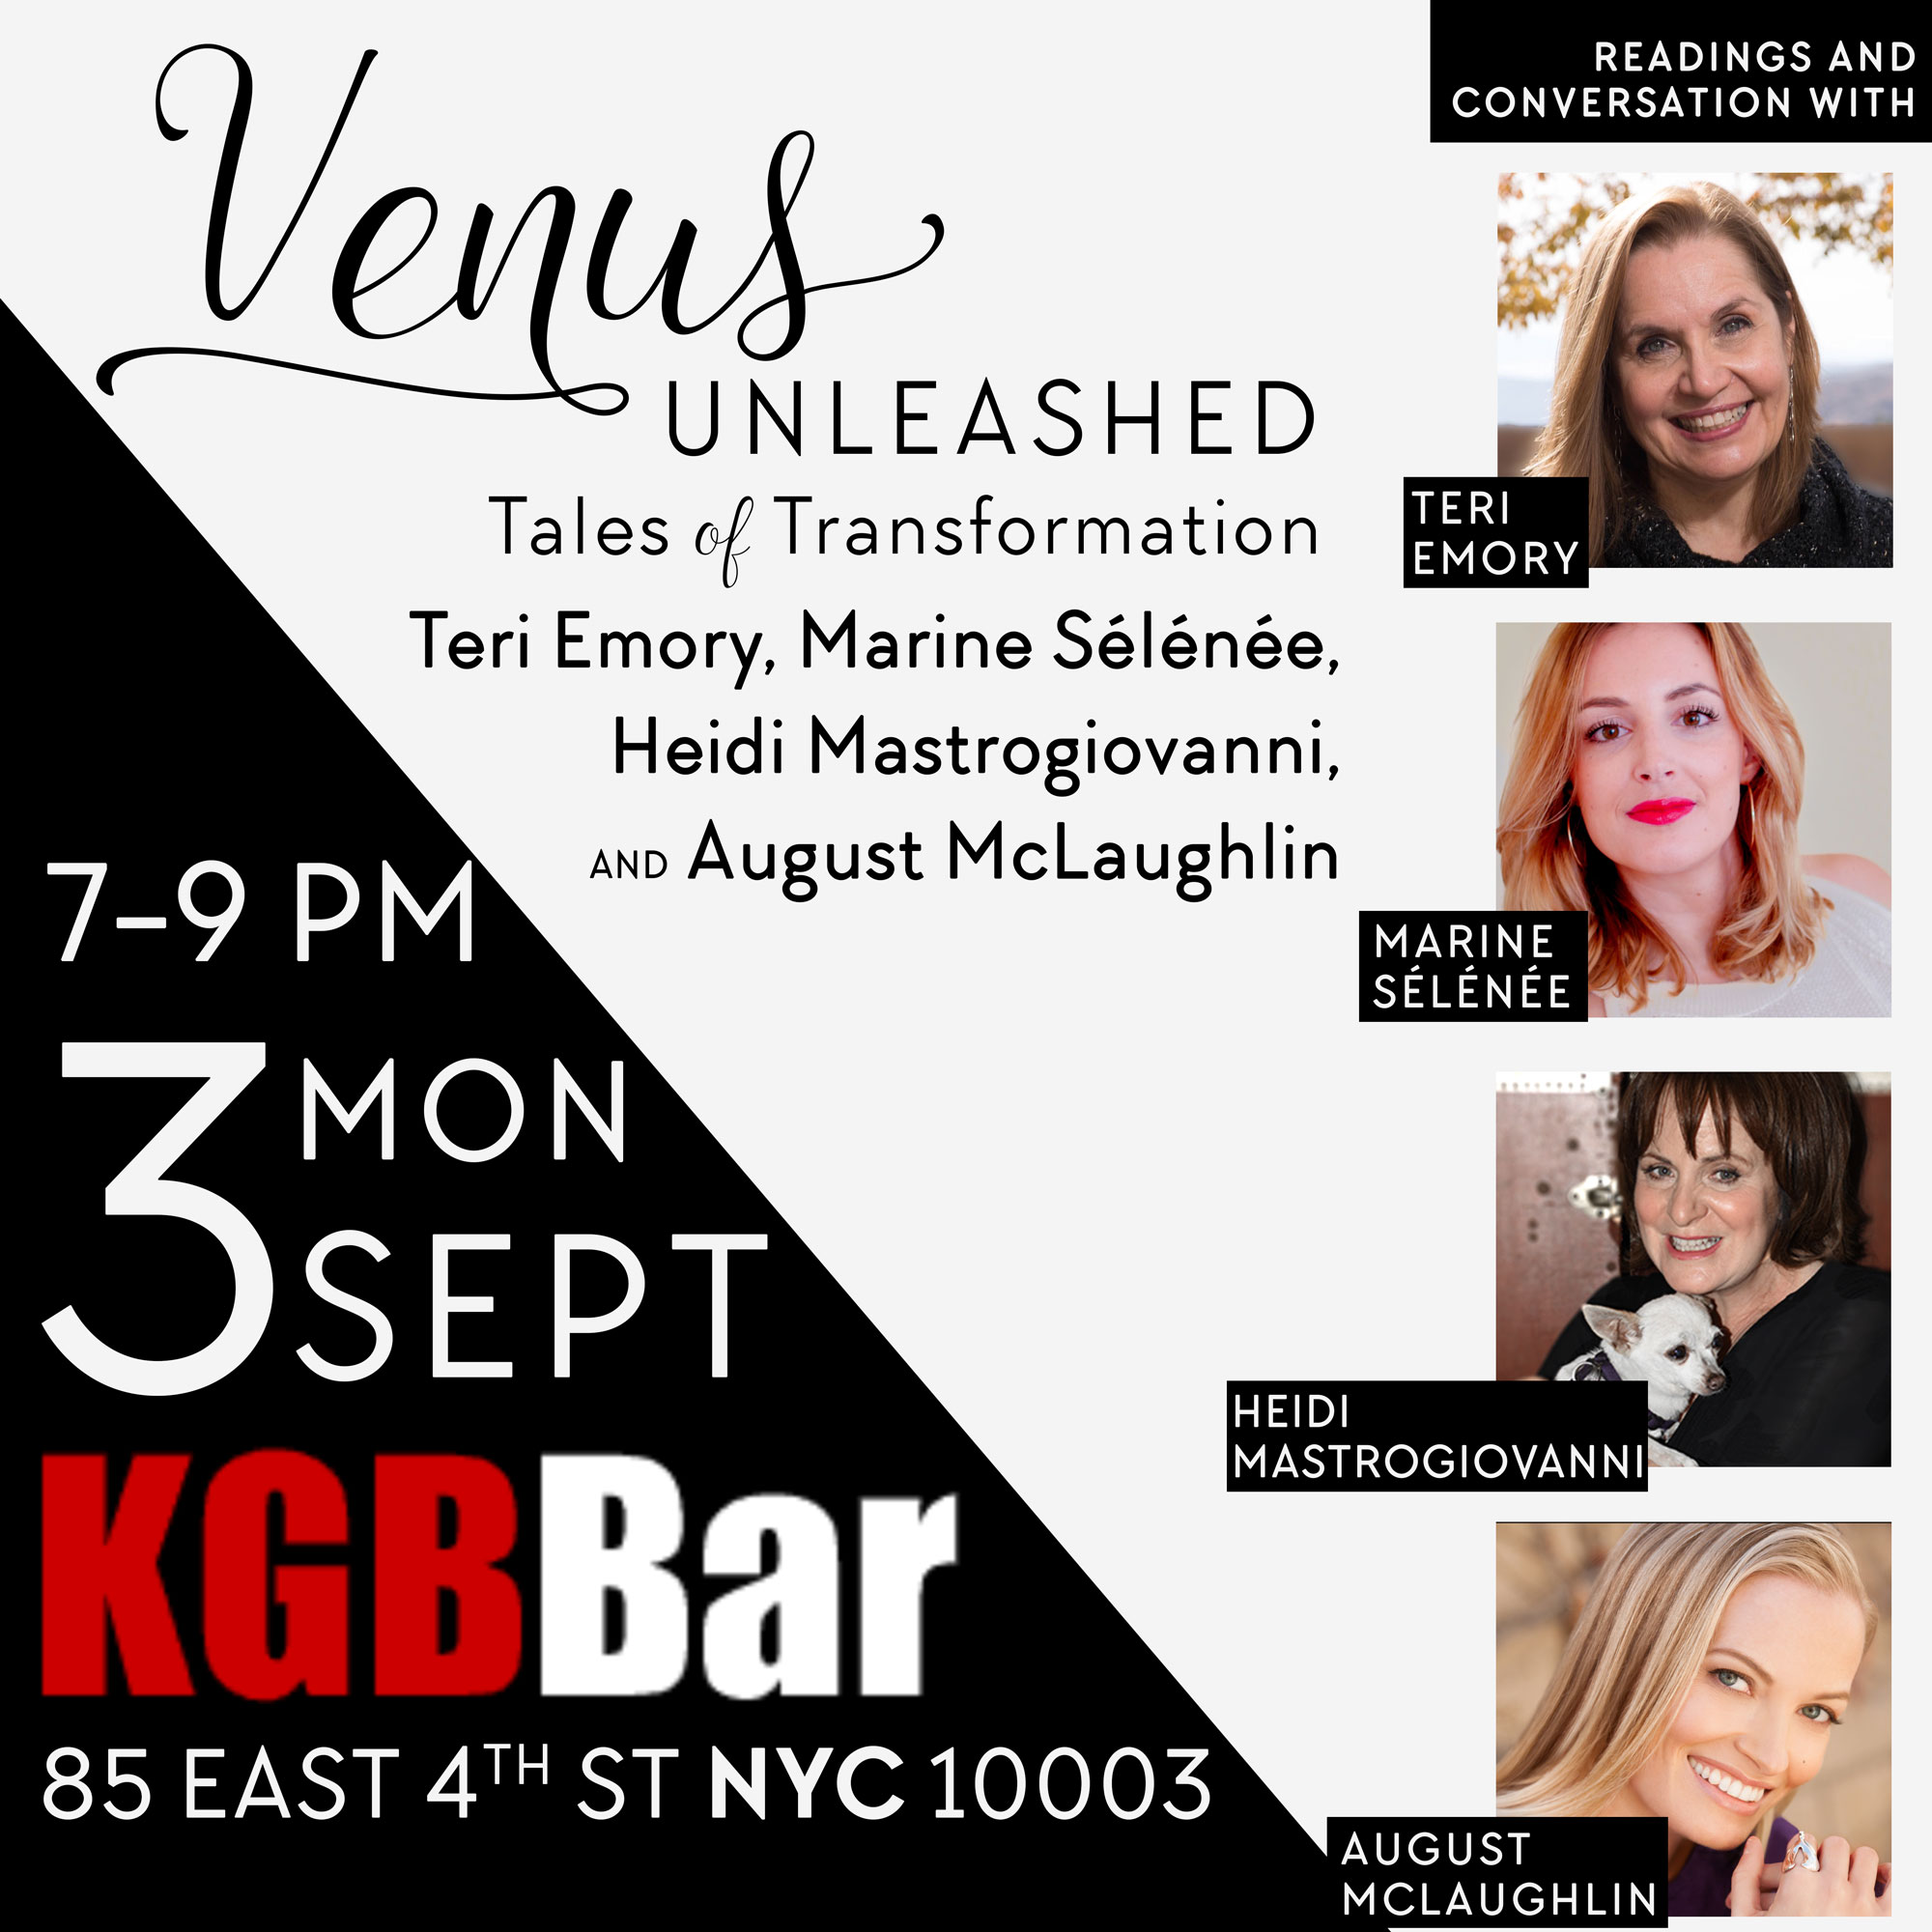 Venus Unleashed, featuring Teri Emory, Heidi Mastrogiovanni, Marine Selenee, and August McLaughlin in NYC